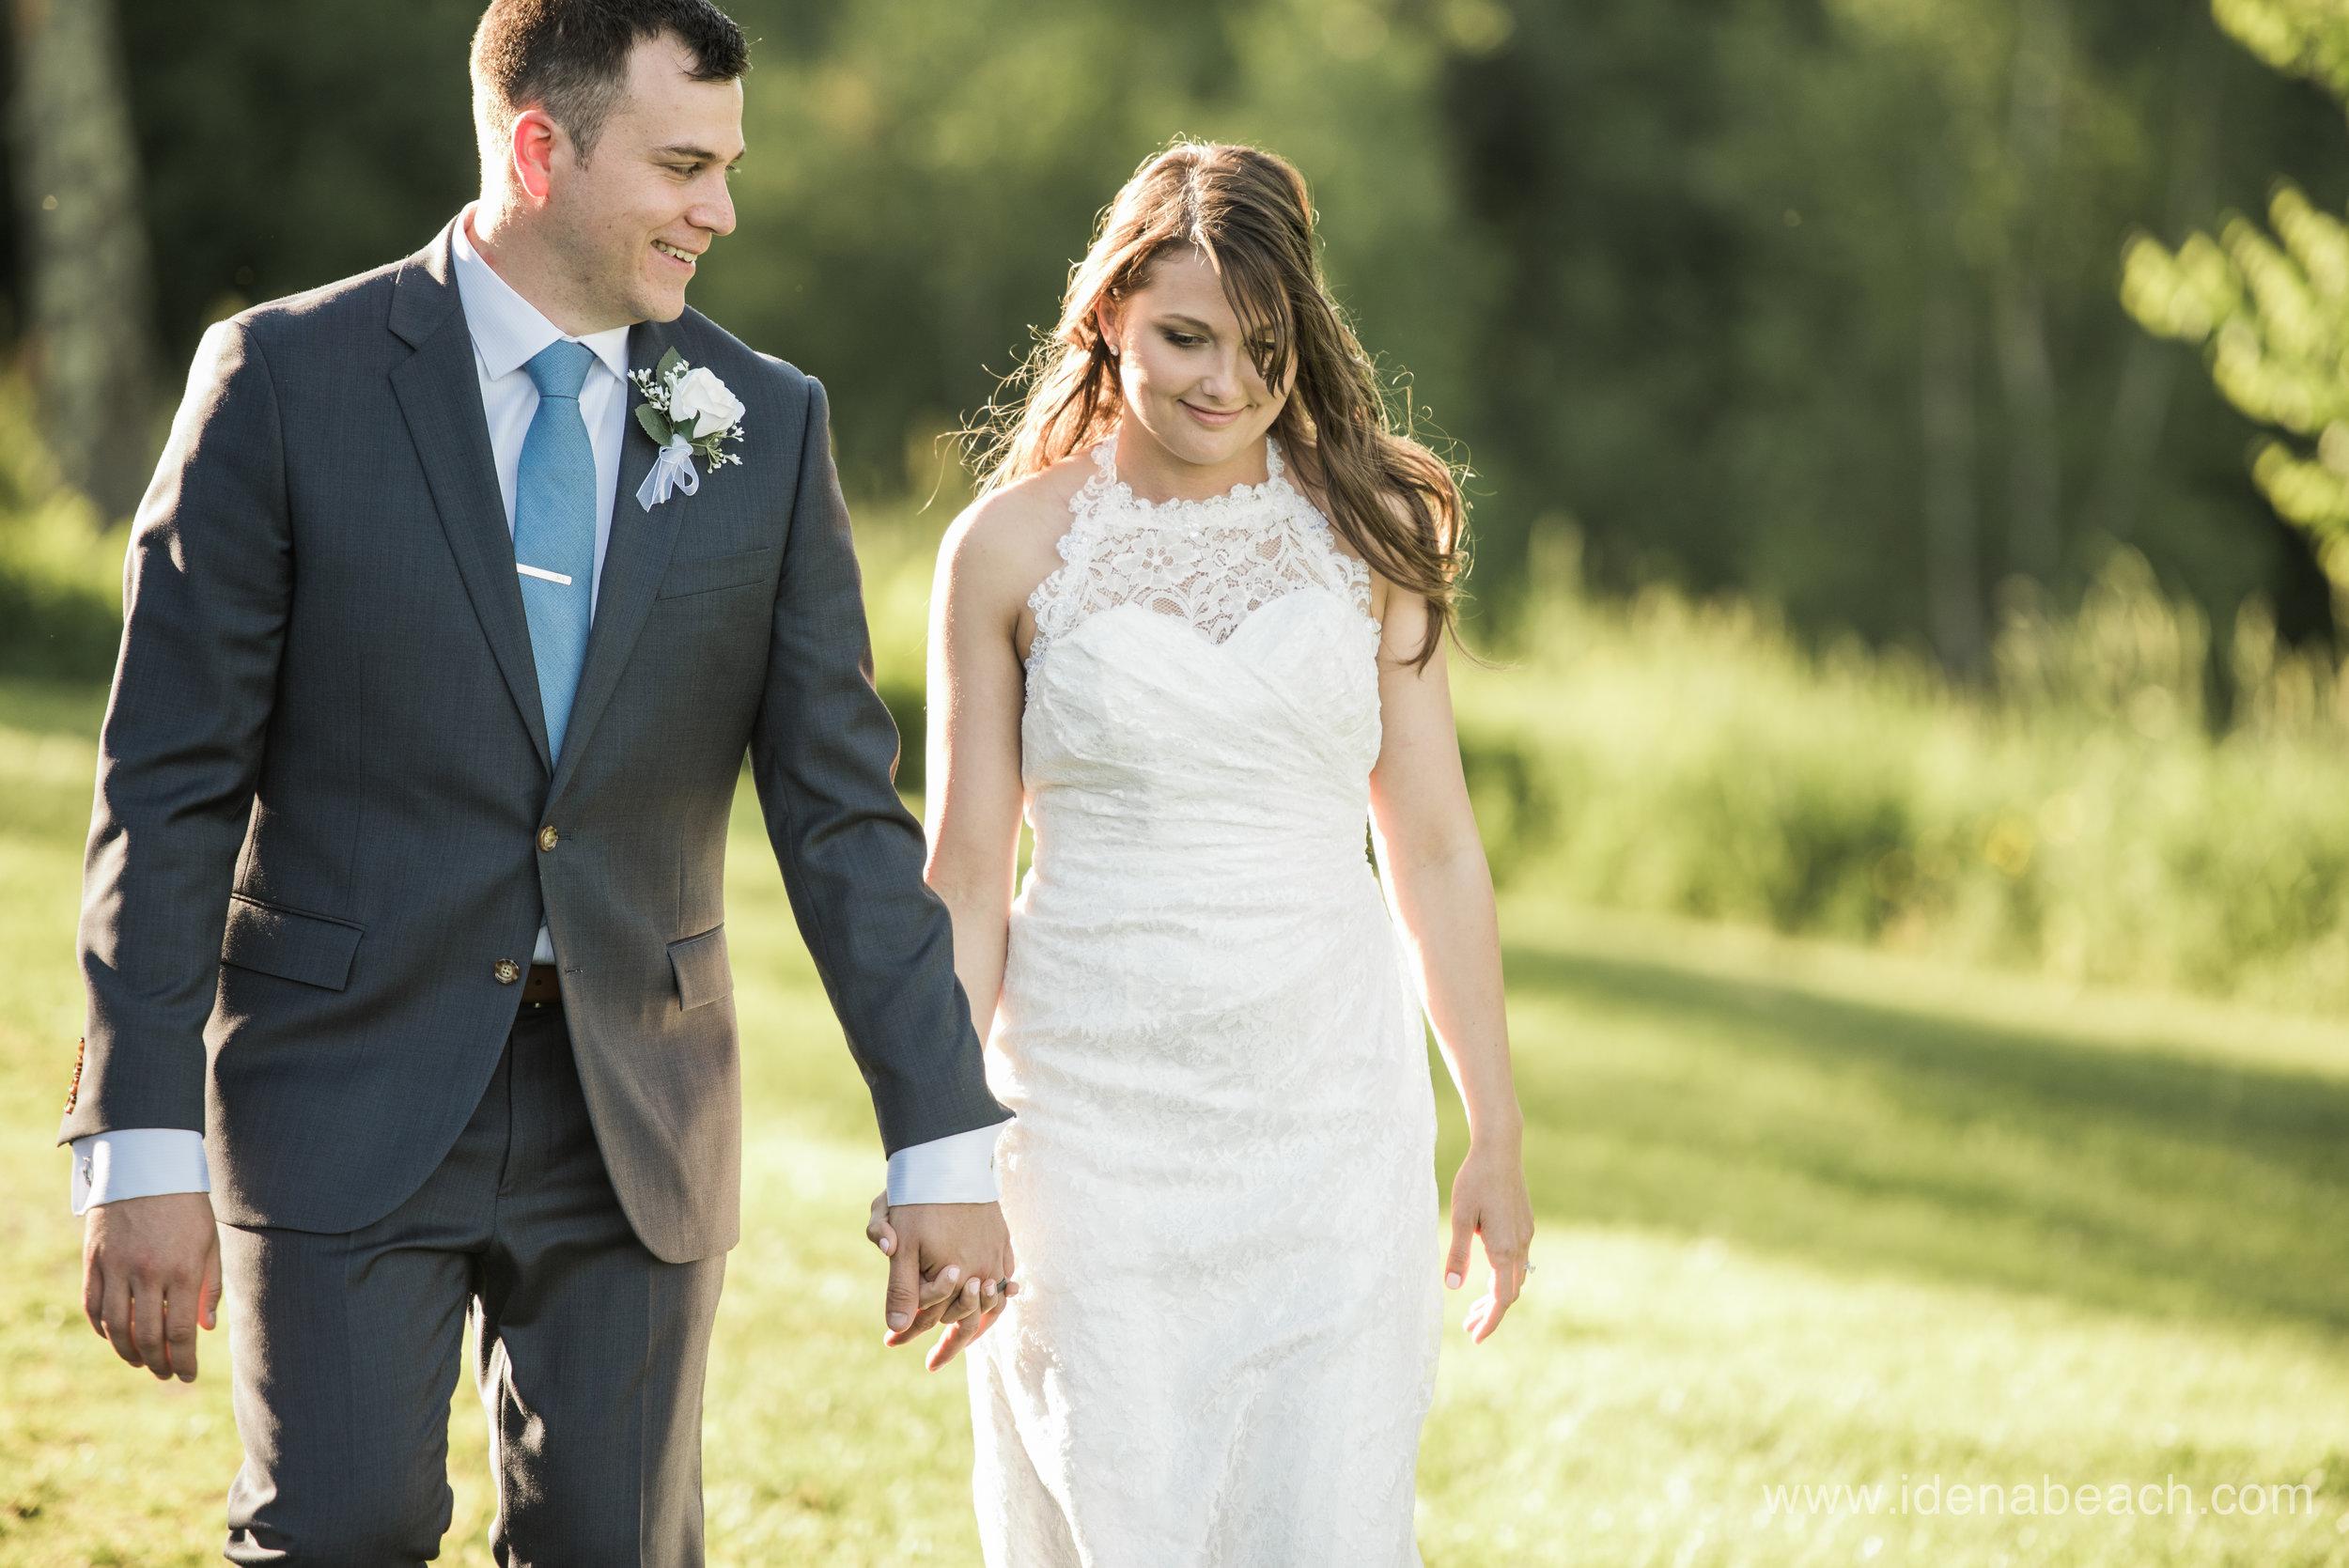 Mountain-Top-Inn-Vermont-Wedding-Photographer-120.jpg